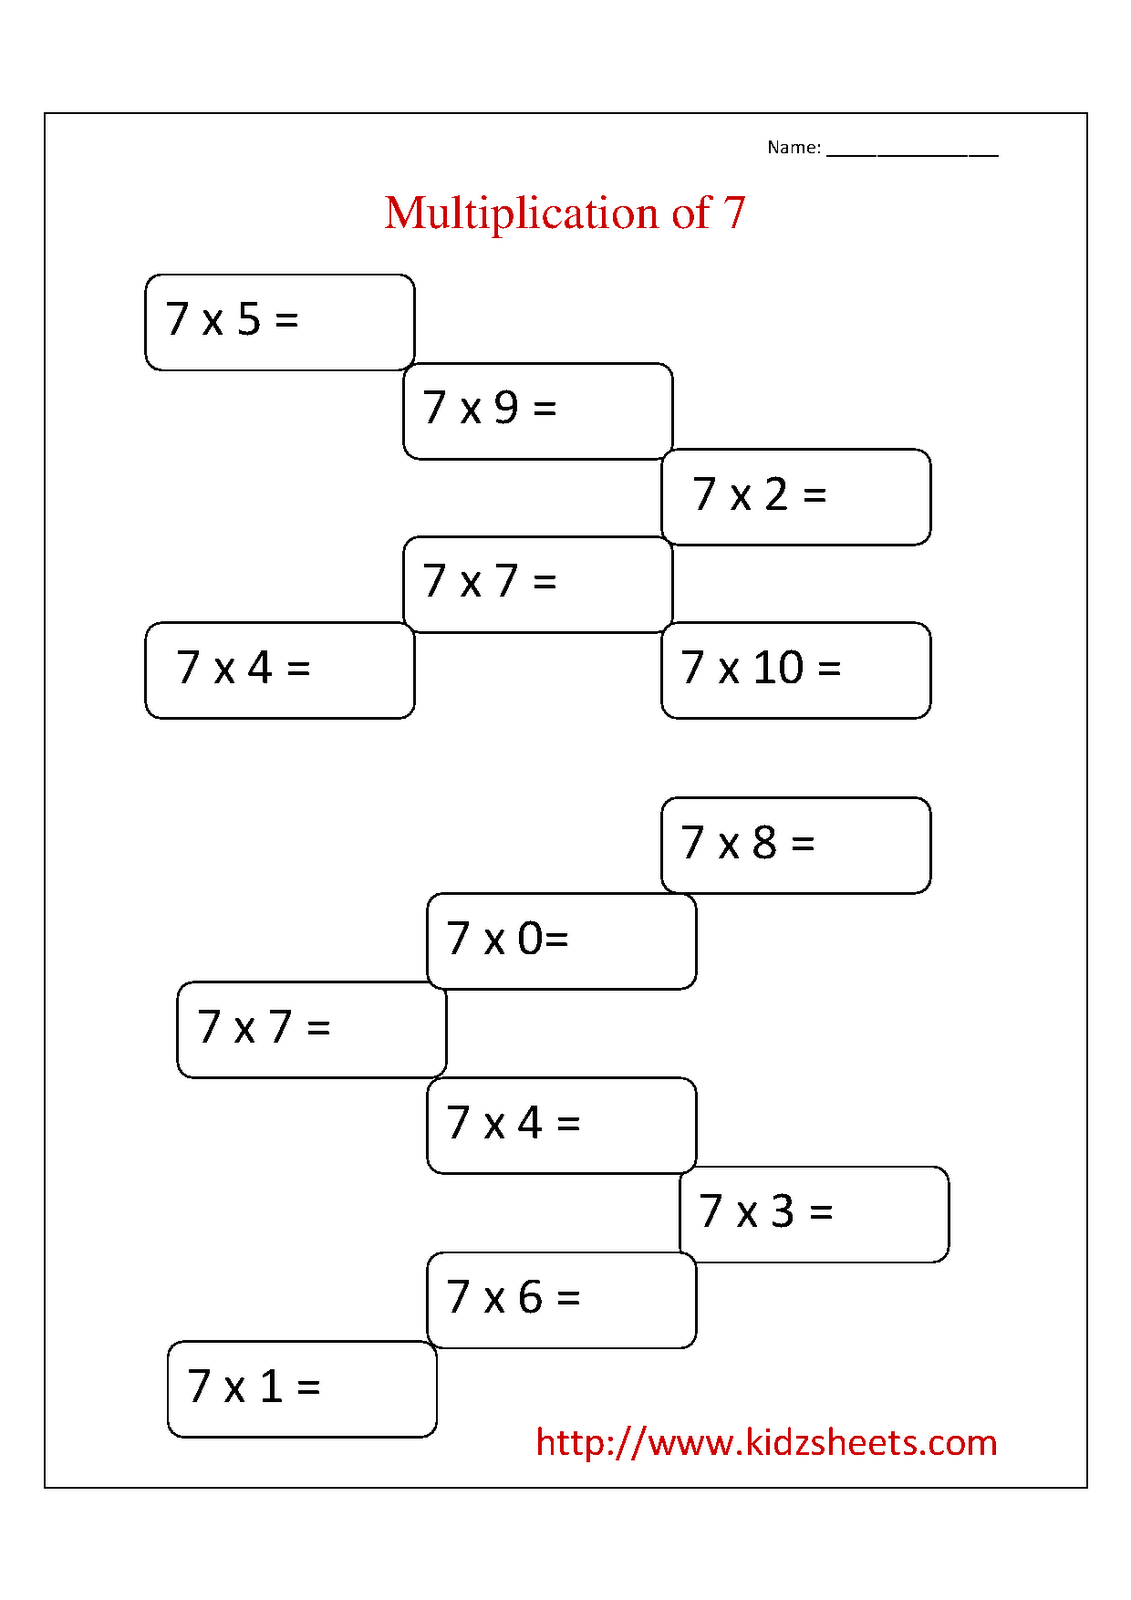 Kidz Worksheets: Second Grade Multiplication Table 7 [ 1600 x 1131 Pixel ]